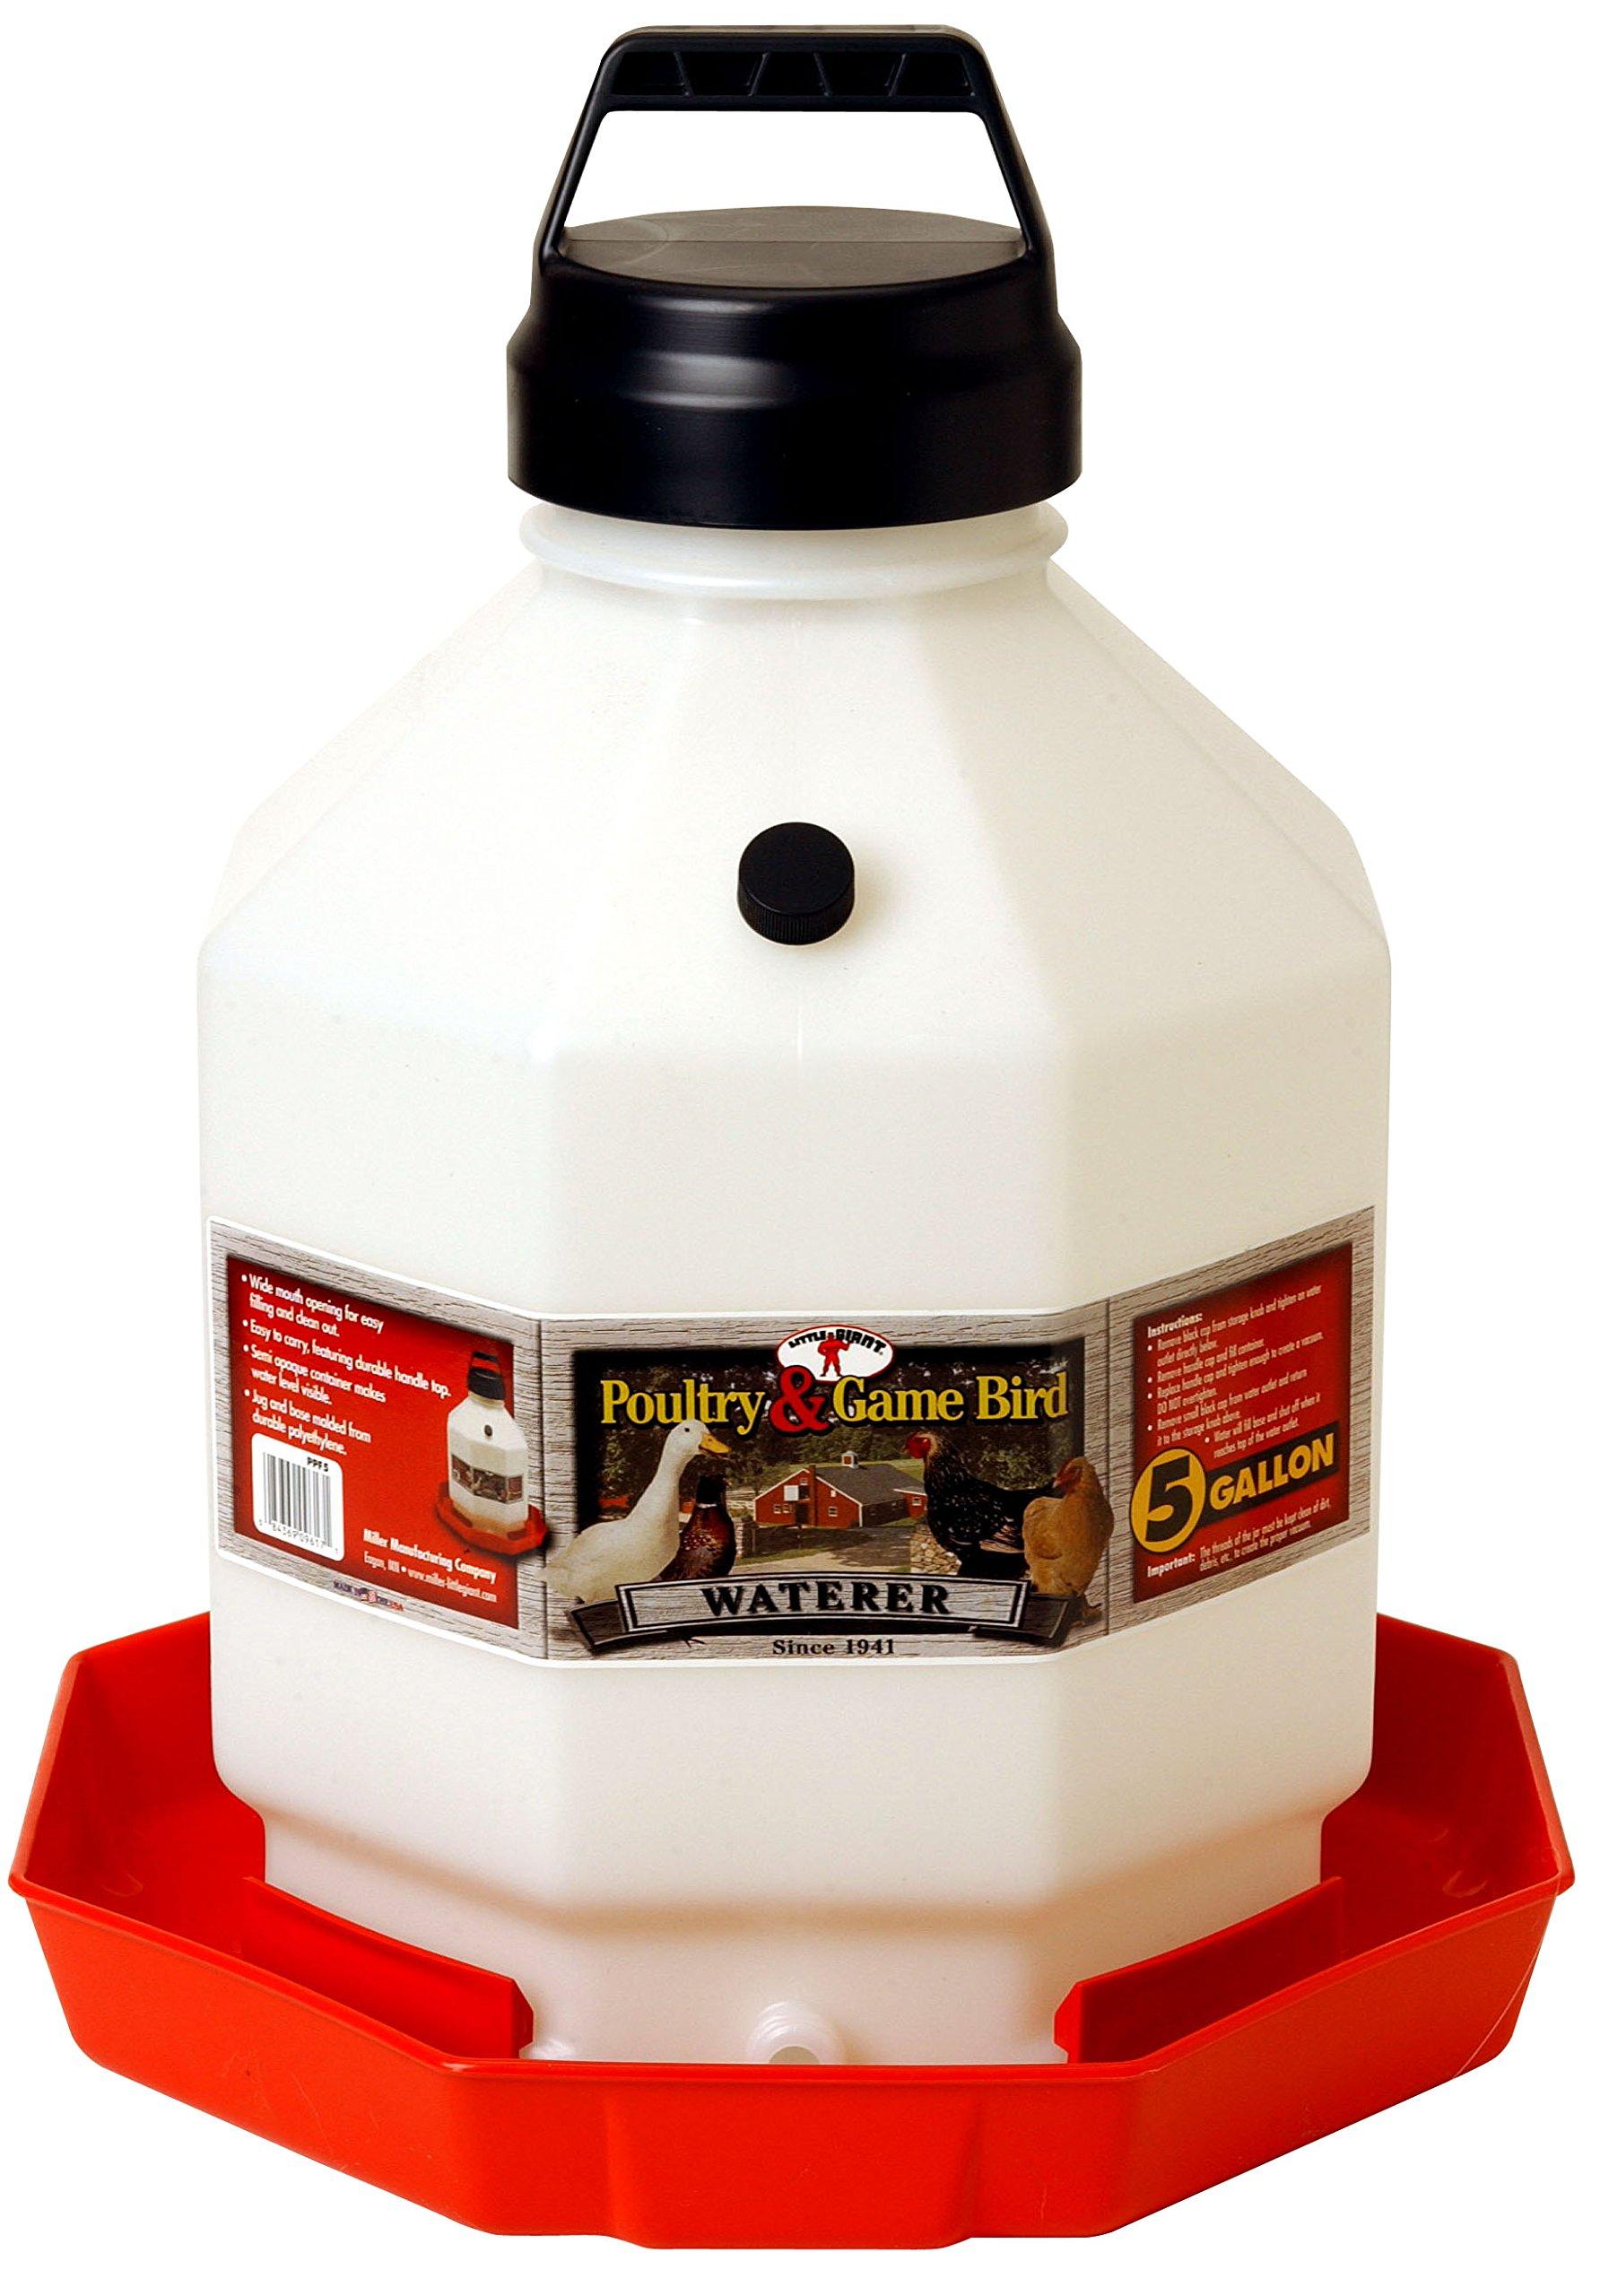 MIller Little Giant 5 Gallon Poultry Waterer Fount - The Best